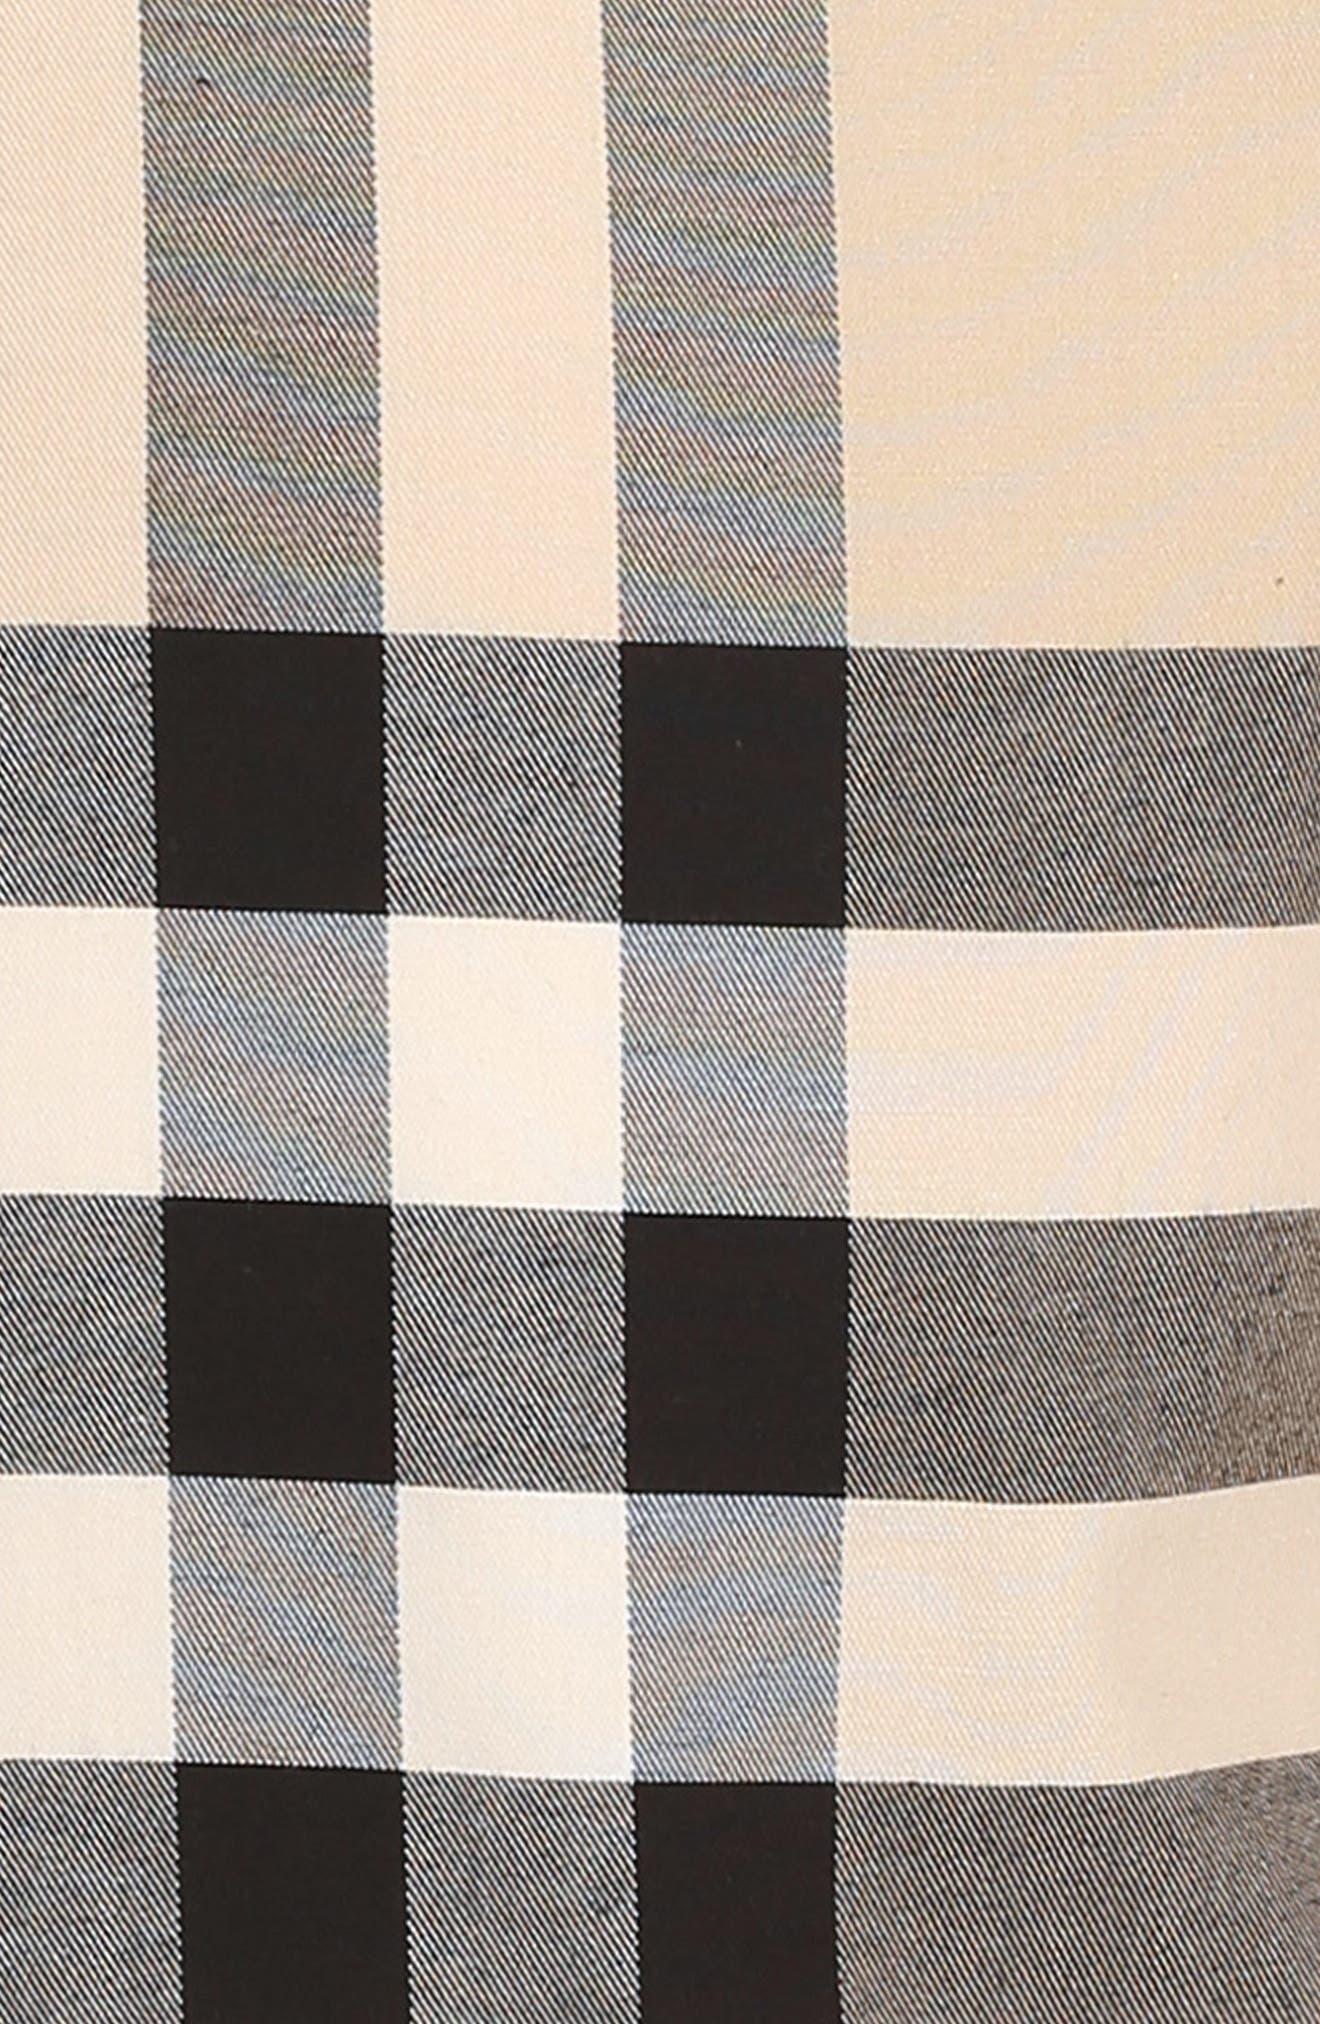 Dawny Check Print Sleeveless Dress,                             Alternate thumbnail 3, color,                             Heritage Stone